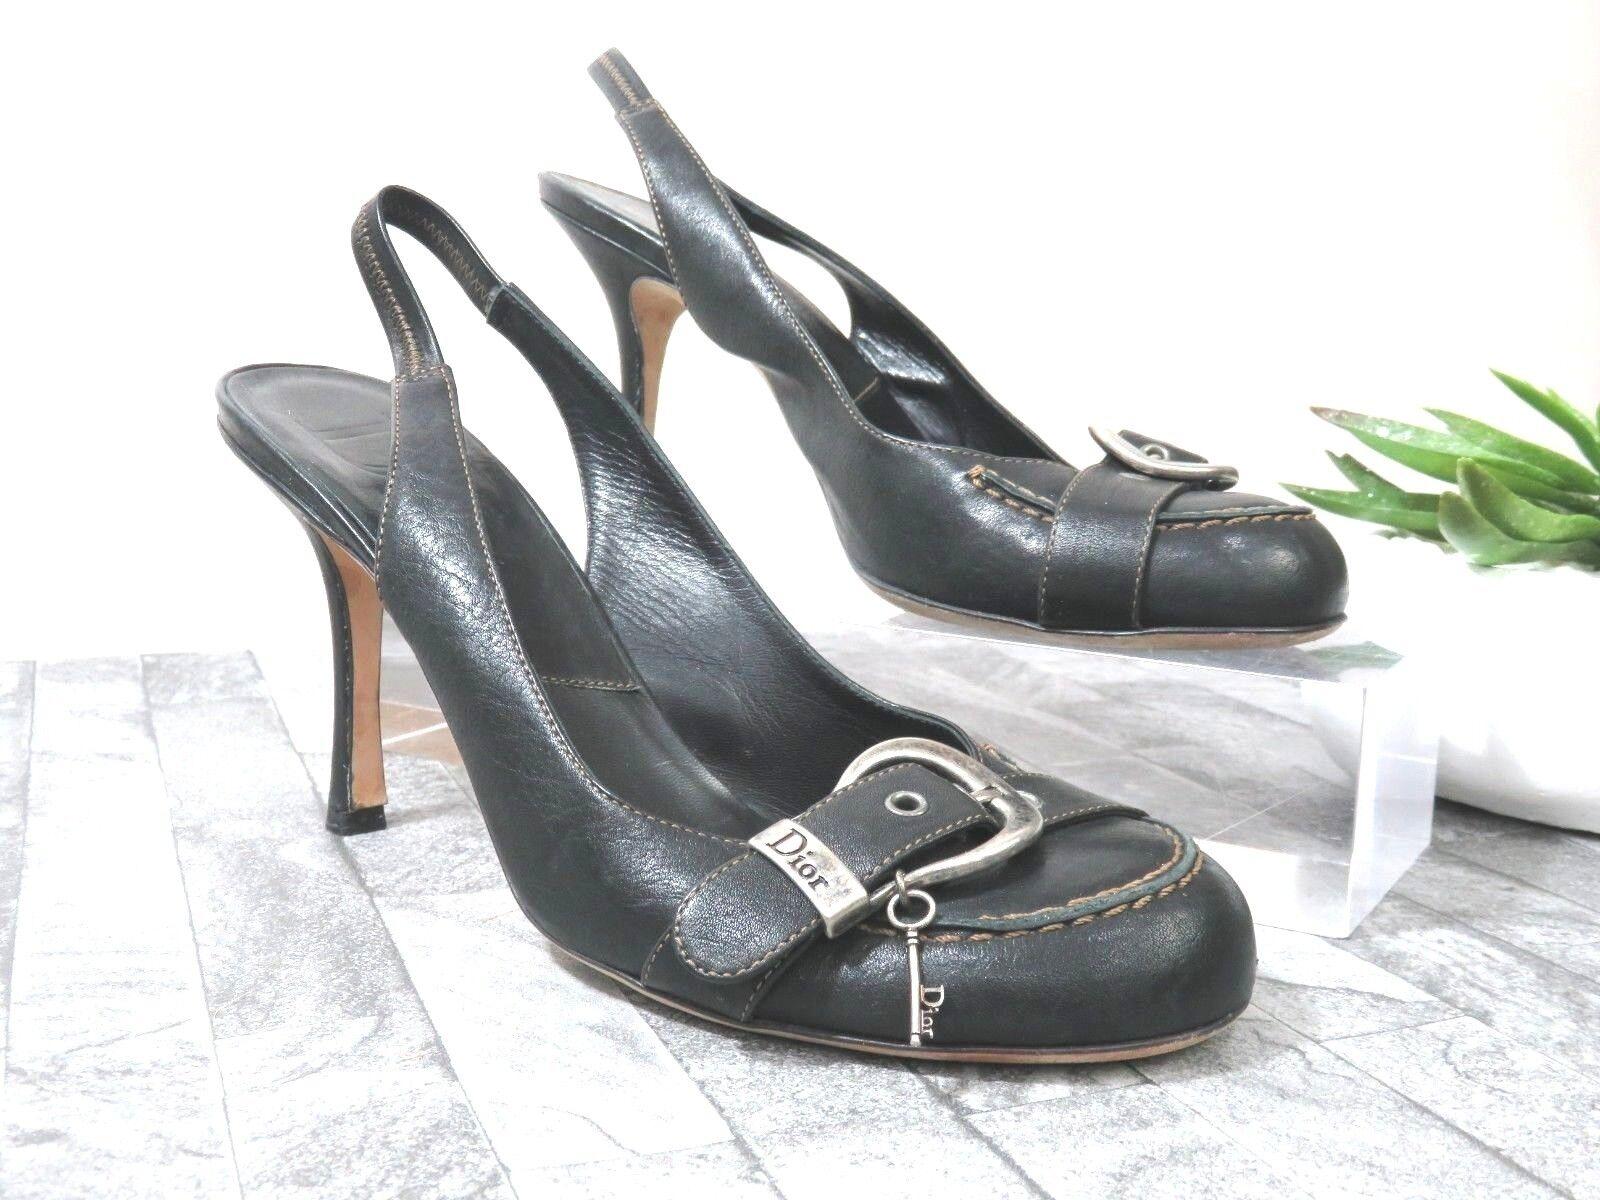 CHRISTIAN DIOR  Black Black Black Leather Dior Buckle Charm Pump Womens Heel shoes Size 39.5 4b1046